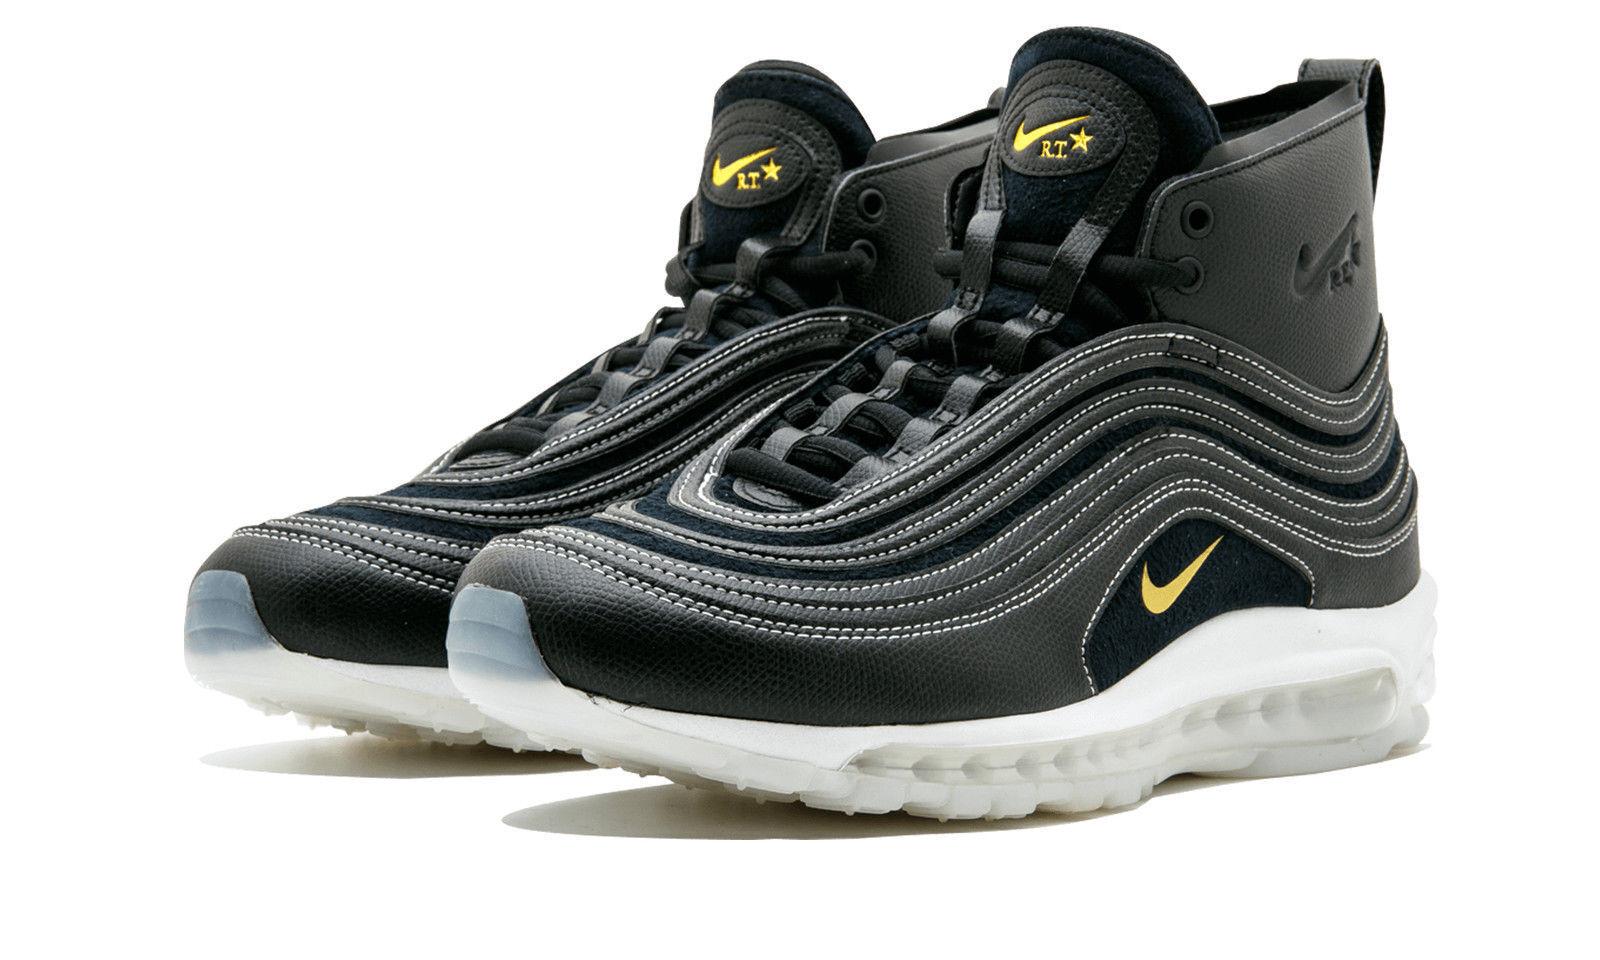 Nike Air Max 97 Mid Riccardo Tisci 913314 001 Men/'s Size 11 US